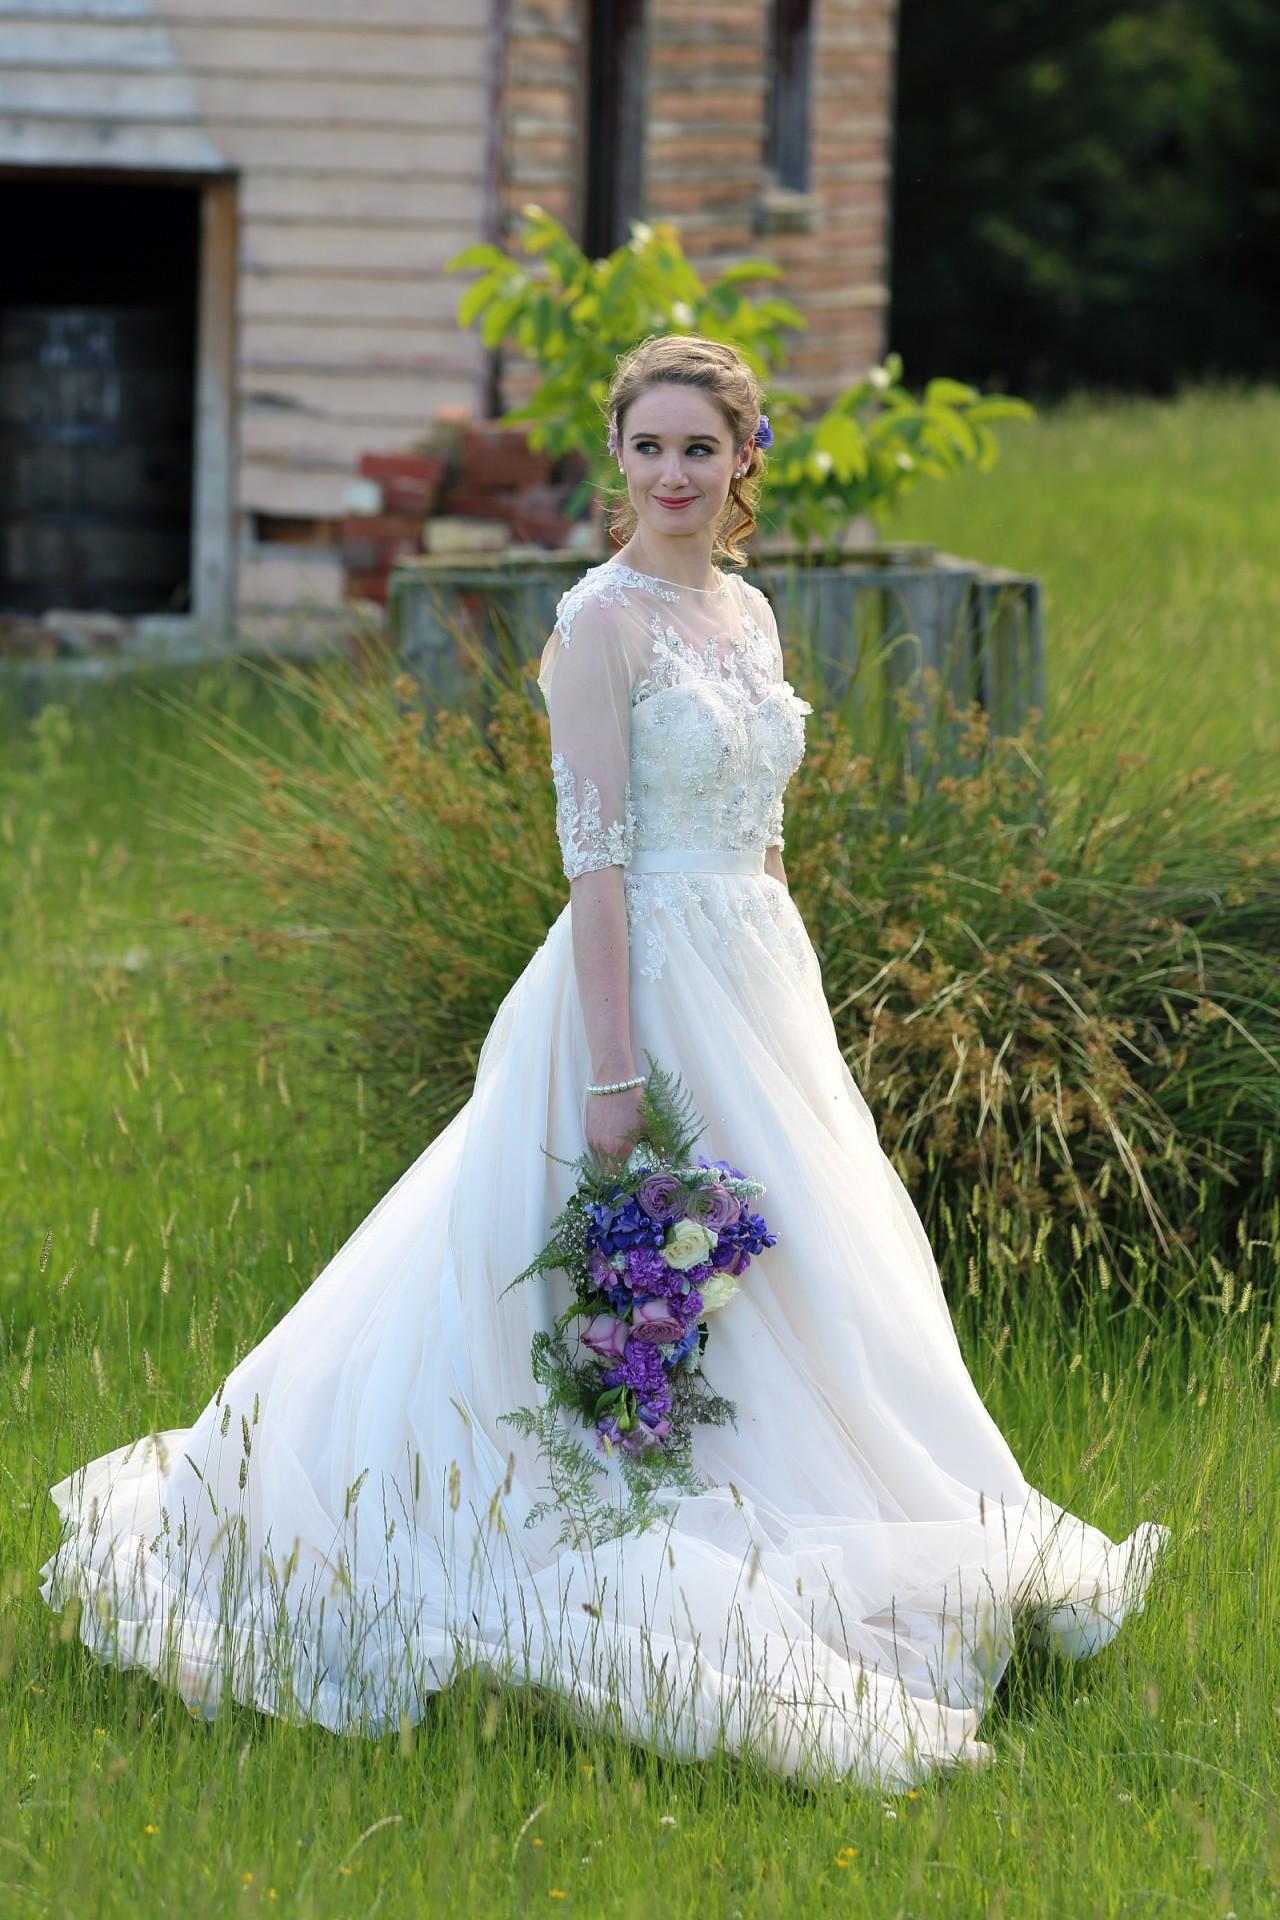 Essense Of Australia Essence D1368 Preloved Wedding Dress Save 60 Stillwhite,Stella York Wedding Dress Prices Uk